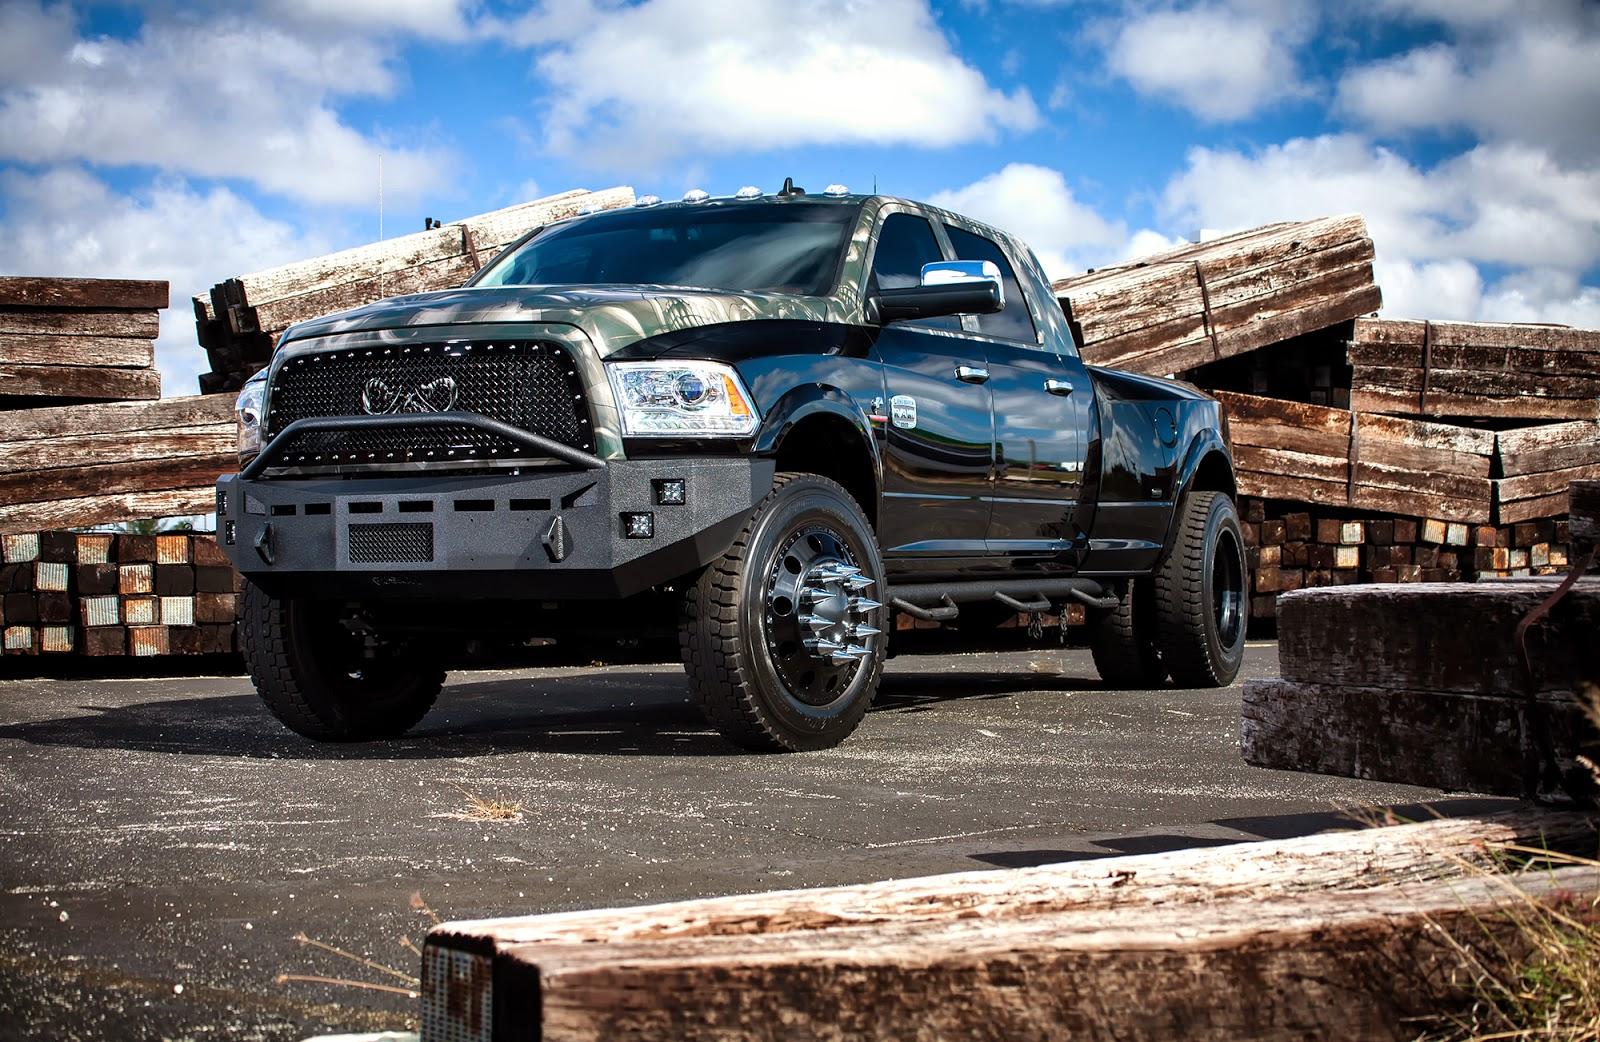 dodge truck photos - Dodge Truck 2015 Custom